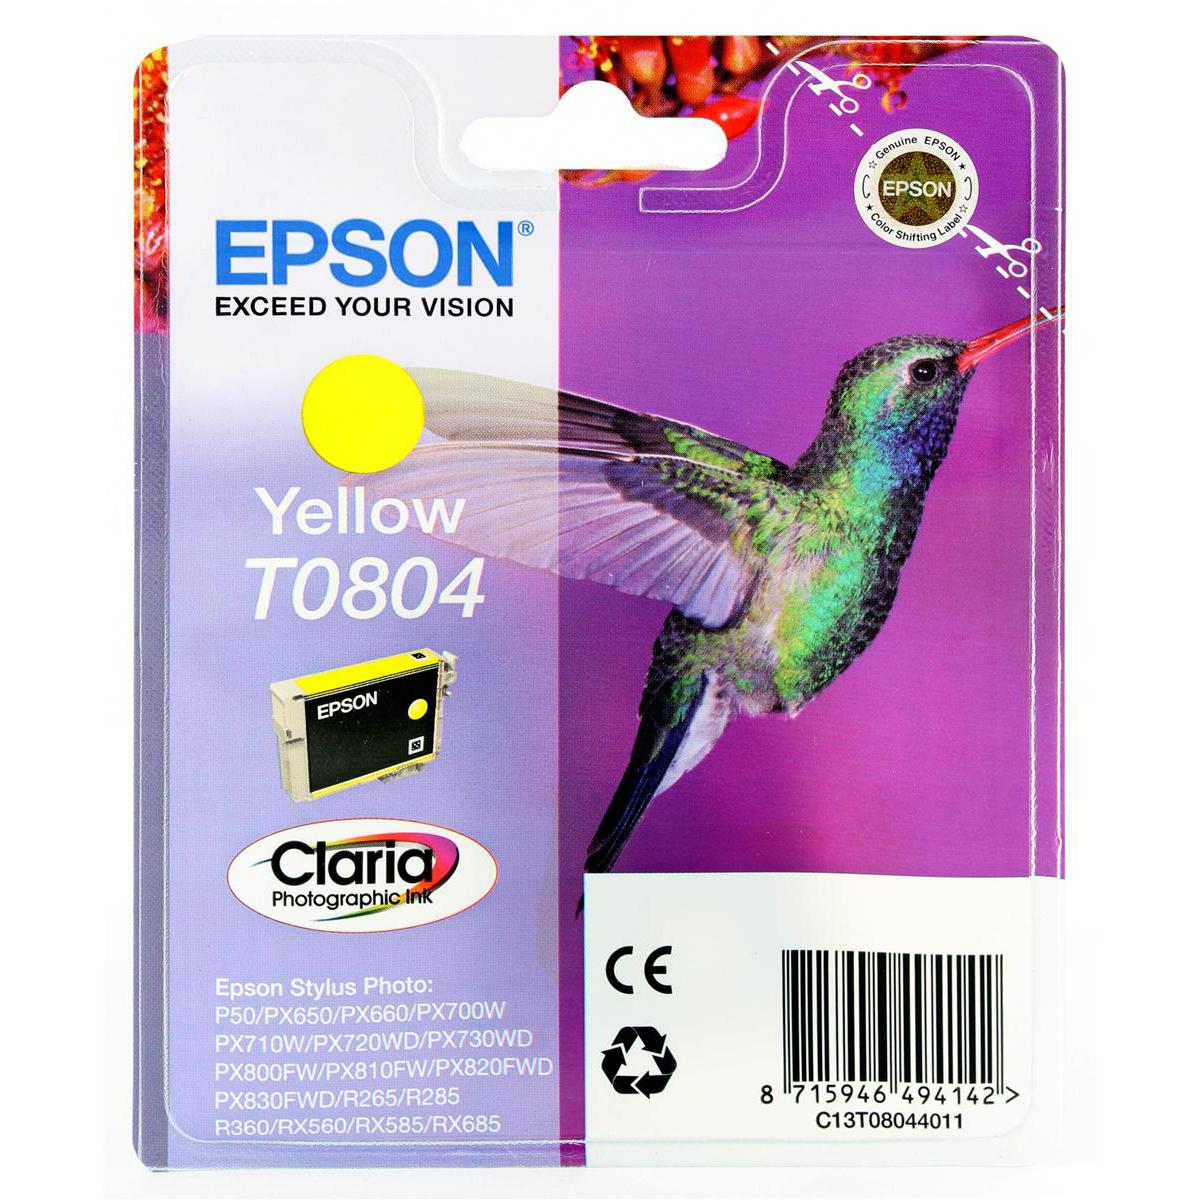 Epson T0804 Inkjet Cartridge Hummingbird Page Life 460pp 7.4ml Yellow Ref C13T08044011